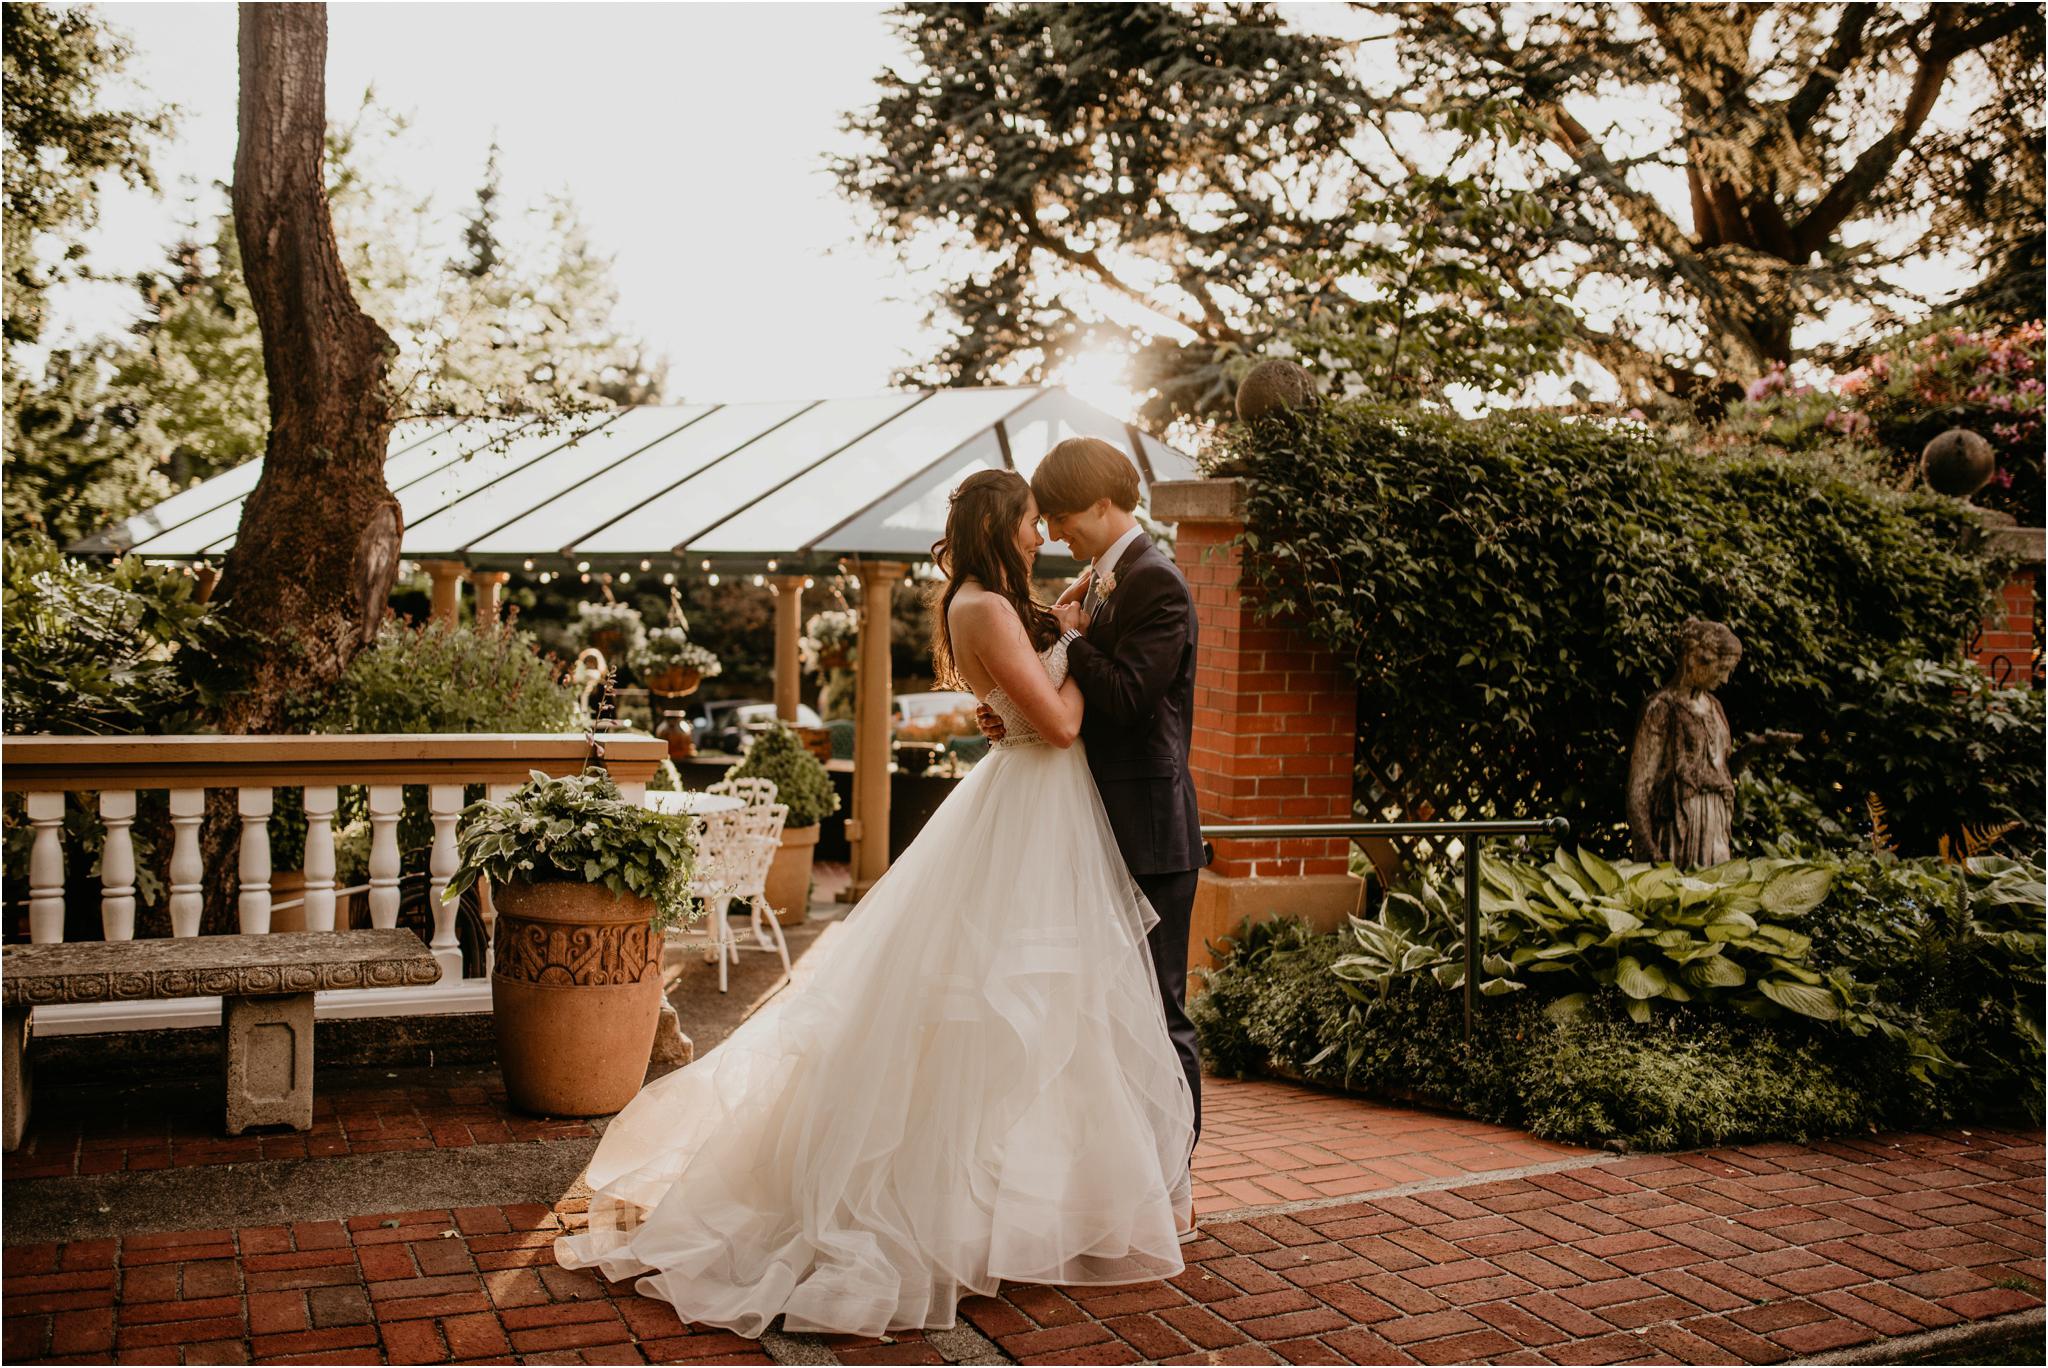 chance-and-ondrea-lairmont-manor-wedding-seattle-photographer-116.jpg